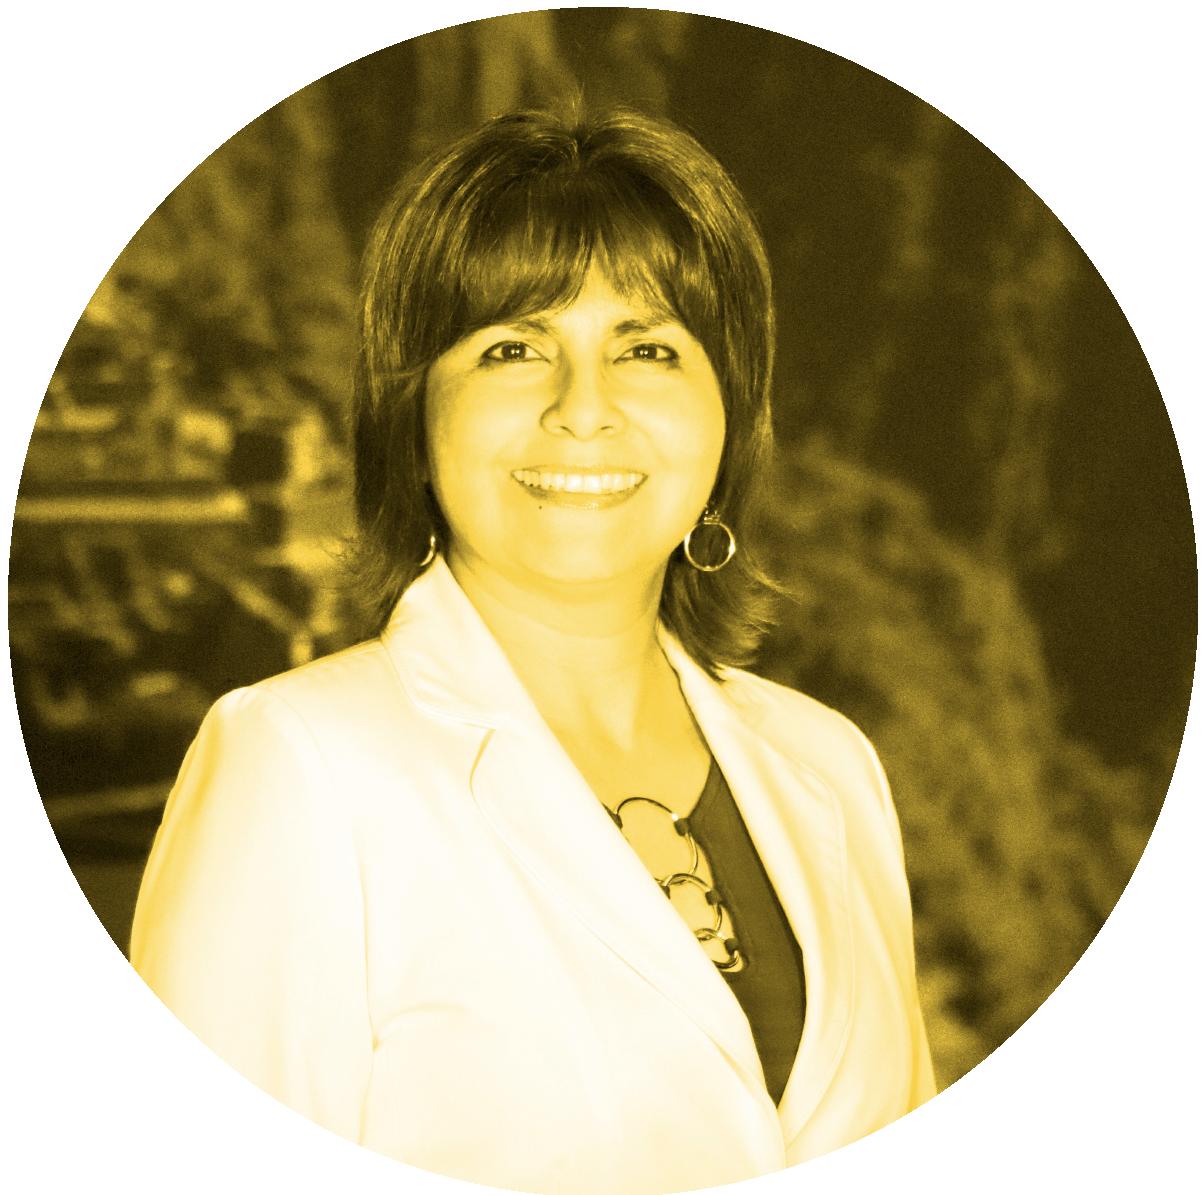 Maria Soledad Acosta Torrelly